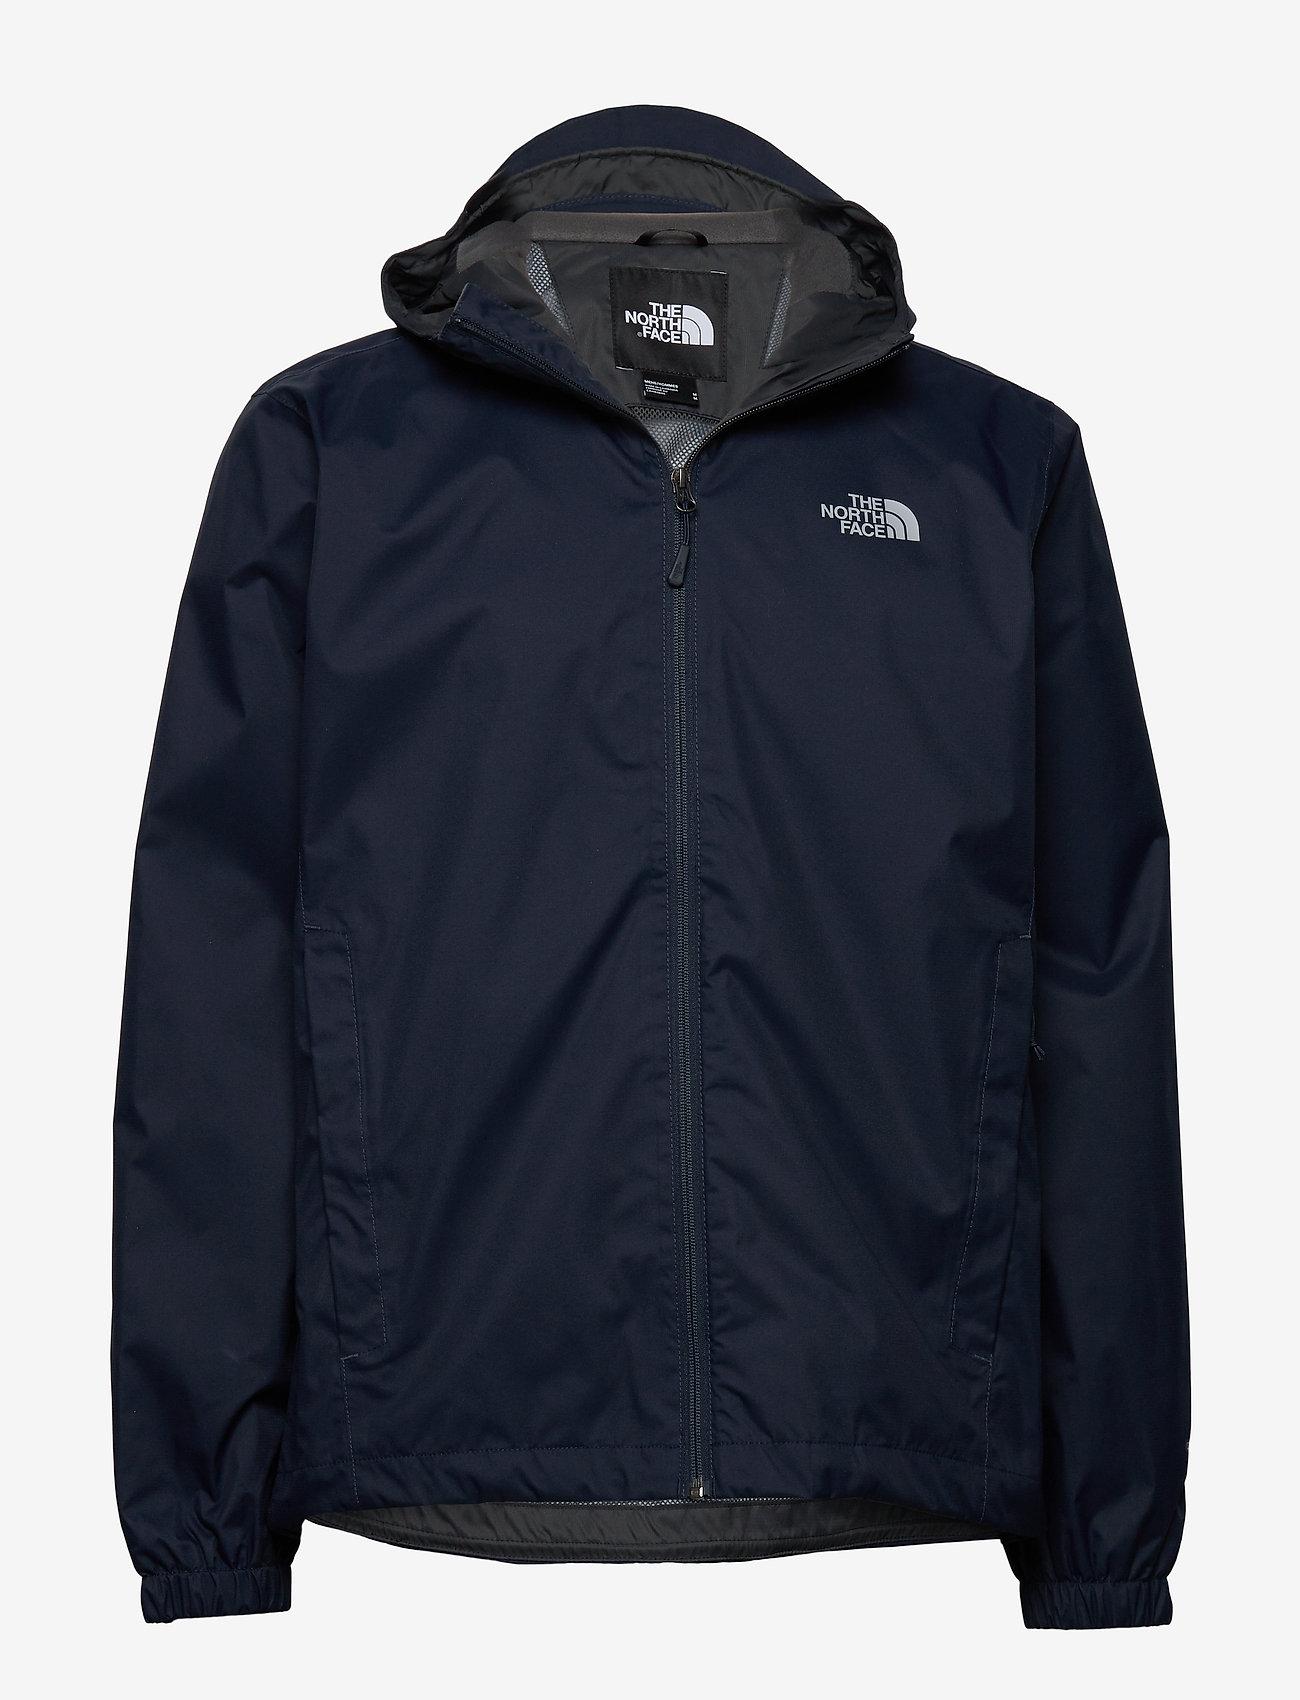 The North Face - M QUEST JACKET - veste sport - urban navy - 0